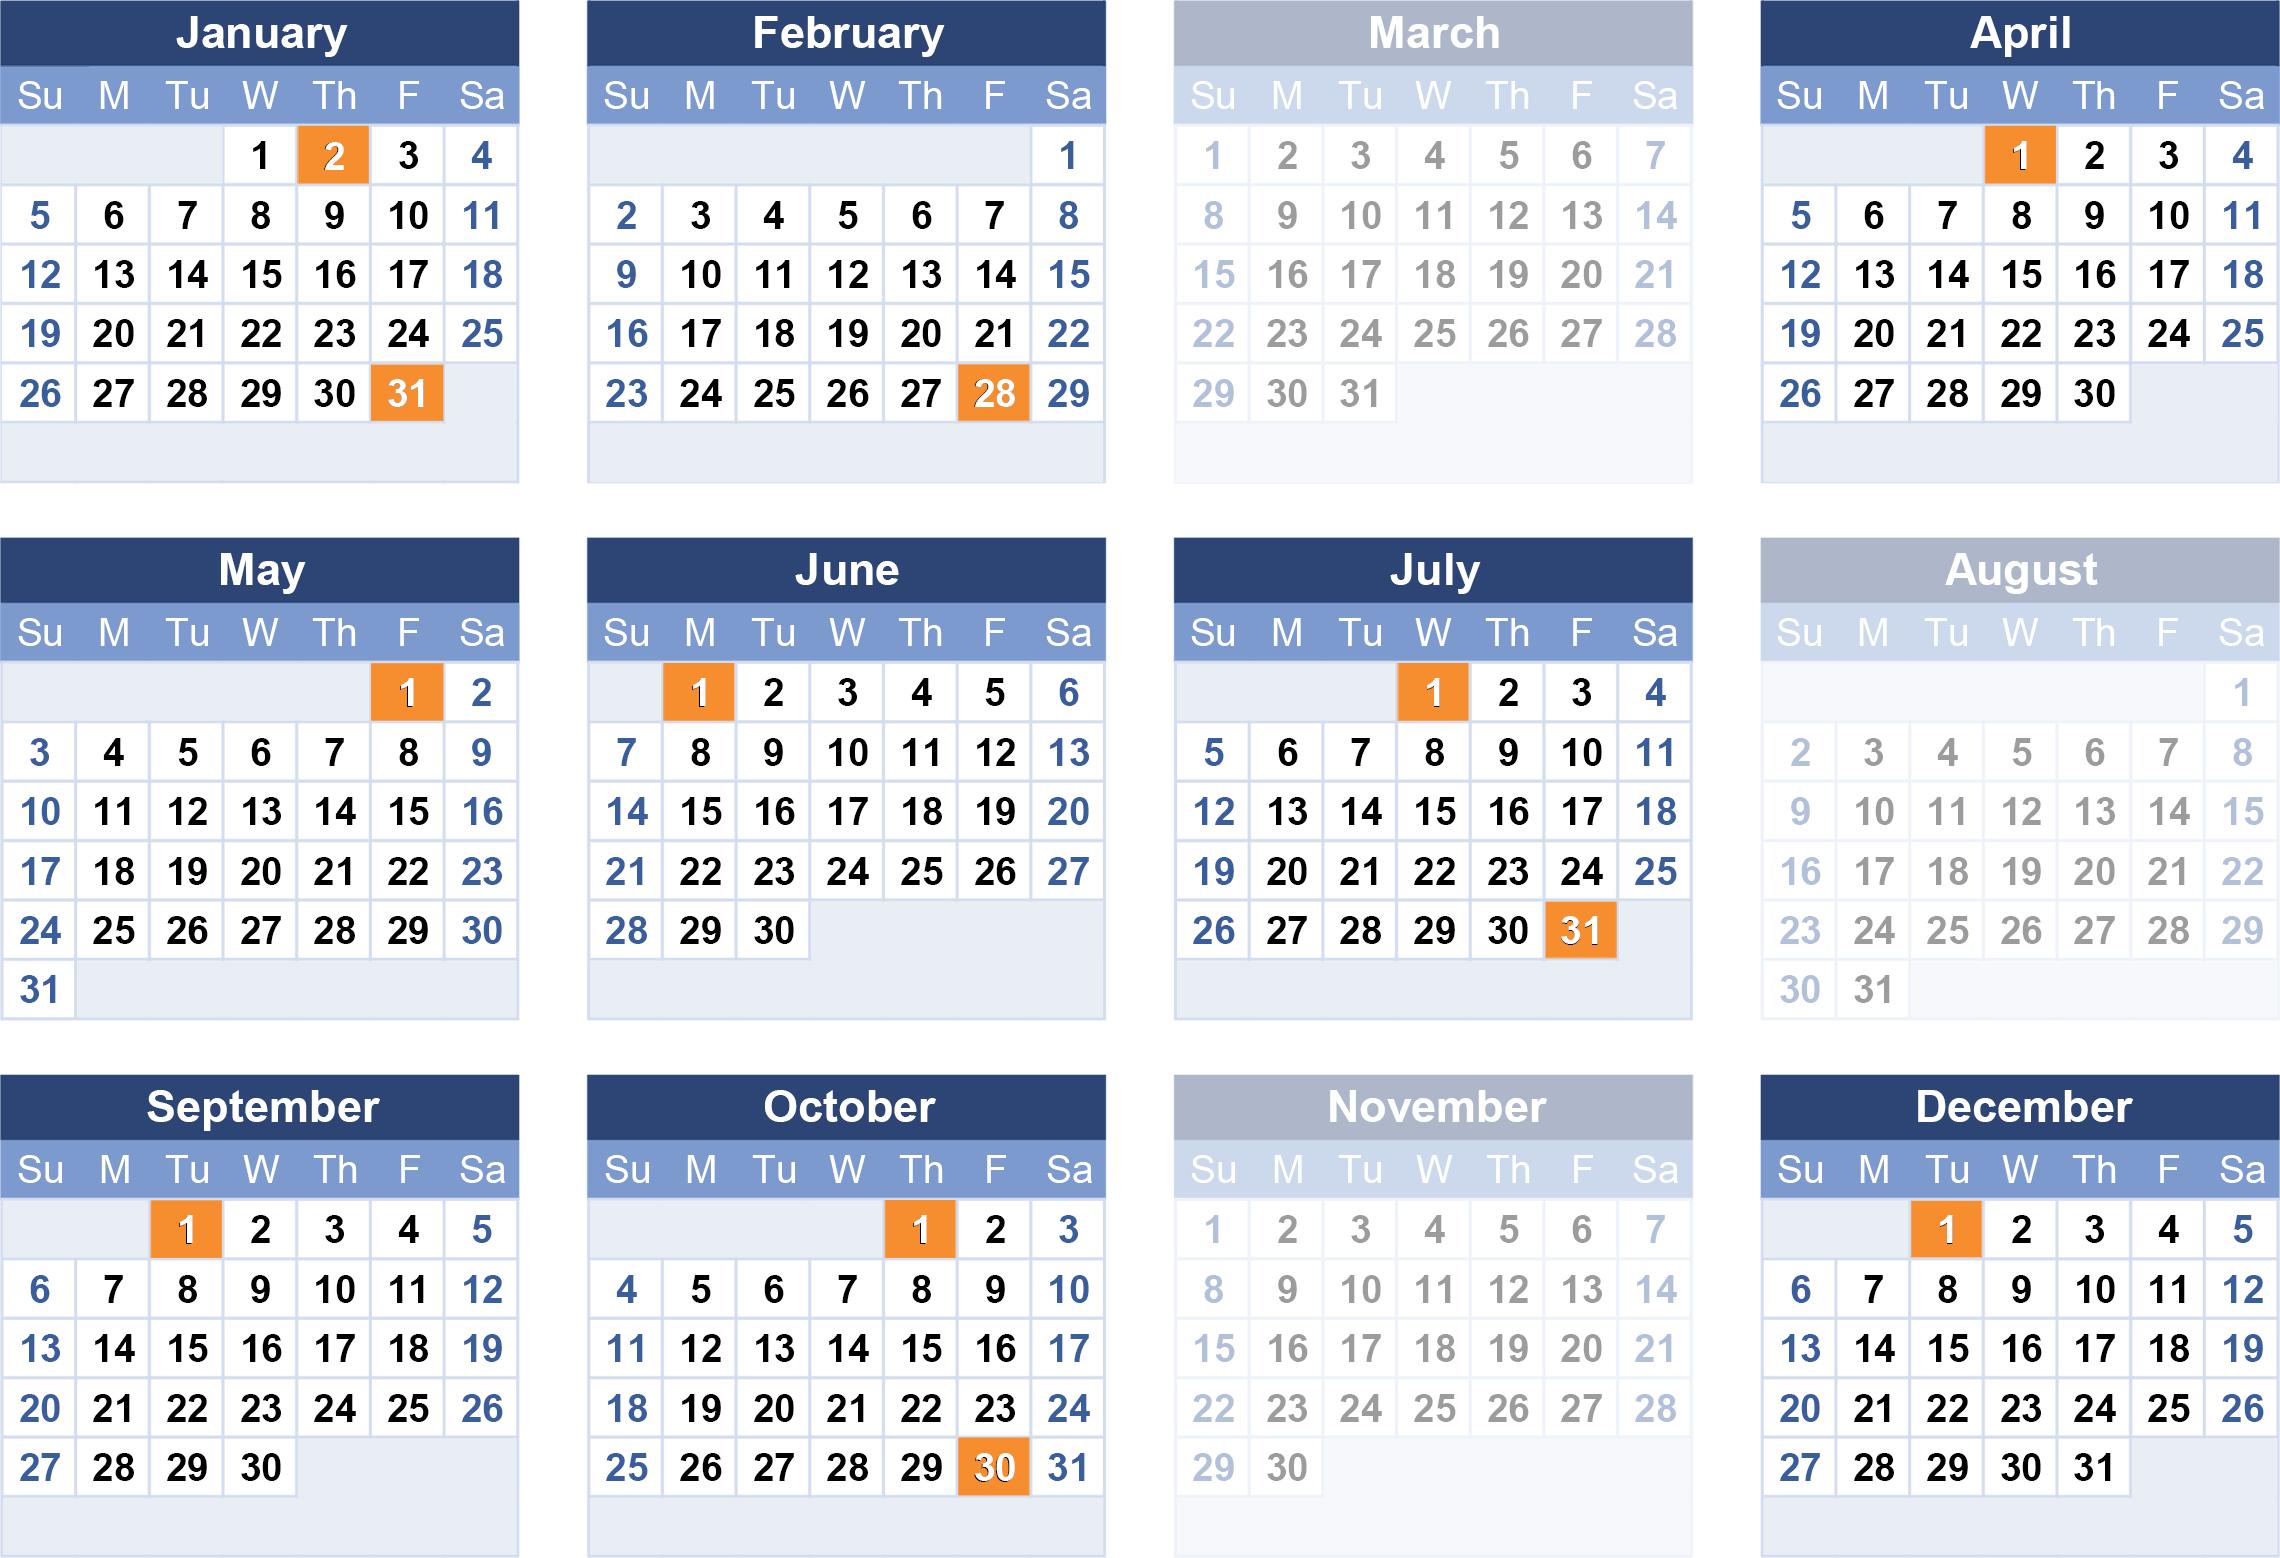 ssa payment schedule 2020